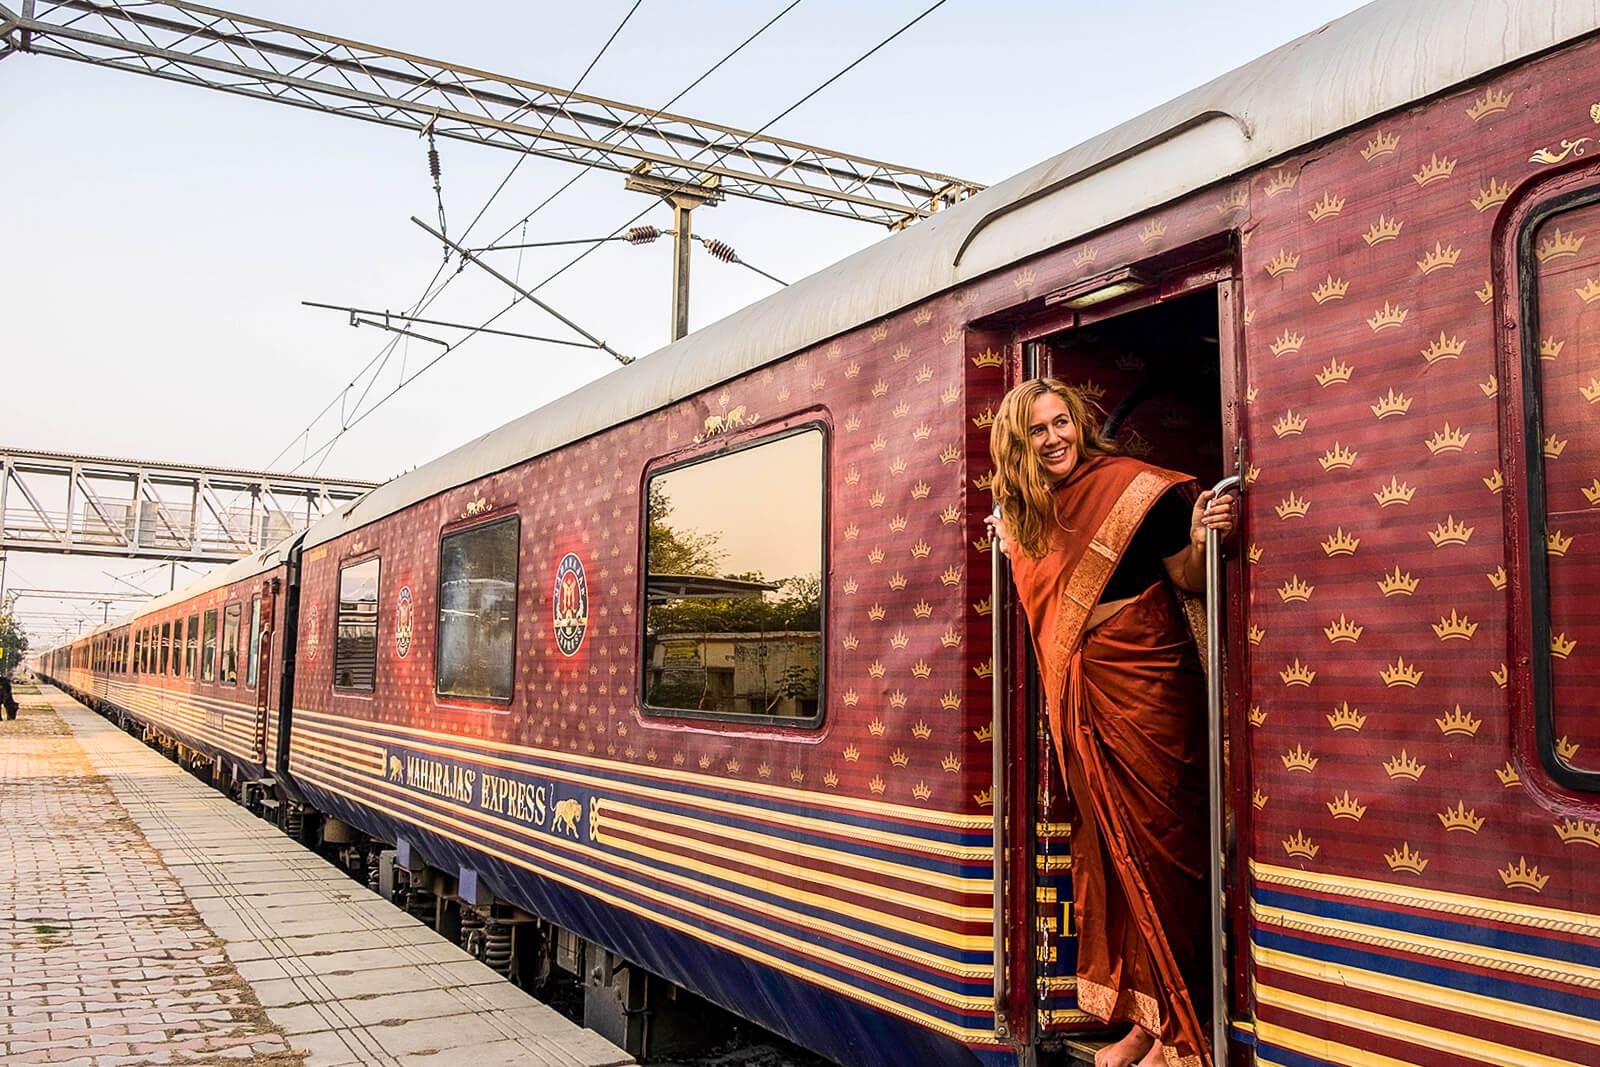 Midnight Blue Elephant at the Maharahaj Express, one of the Luxury Trains of India